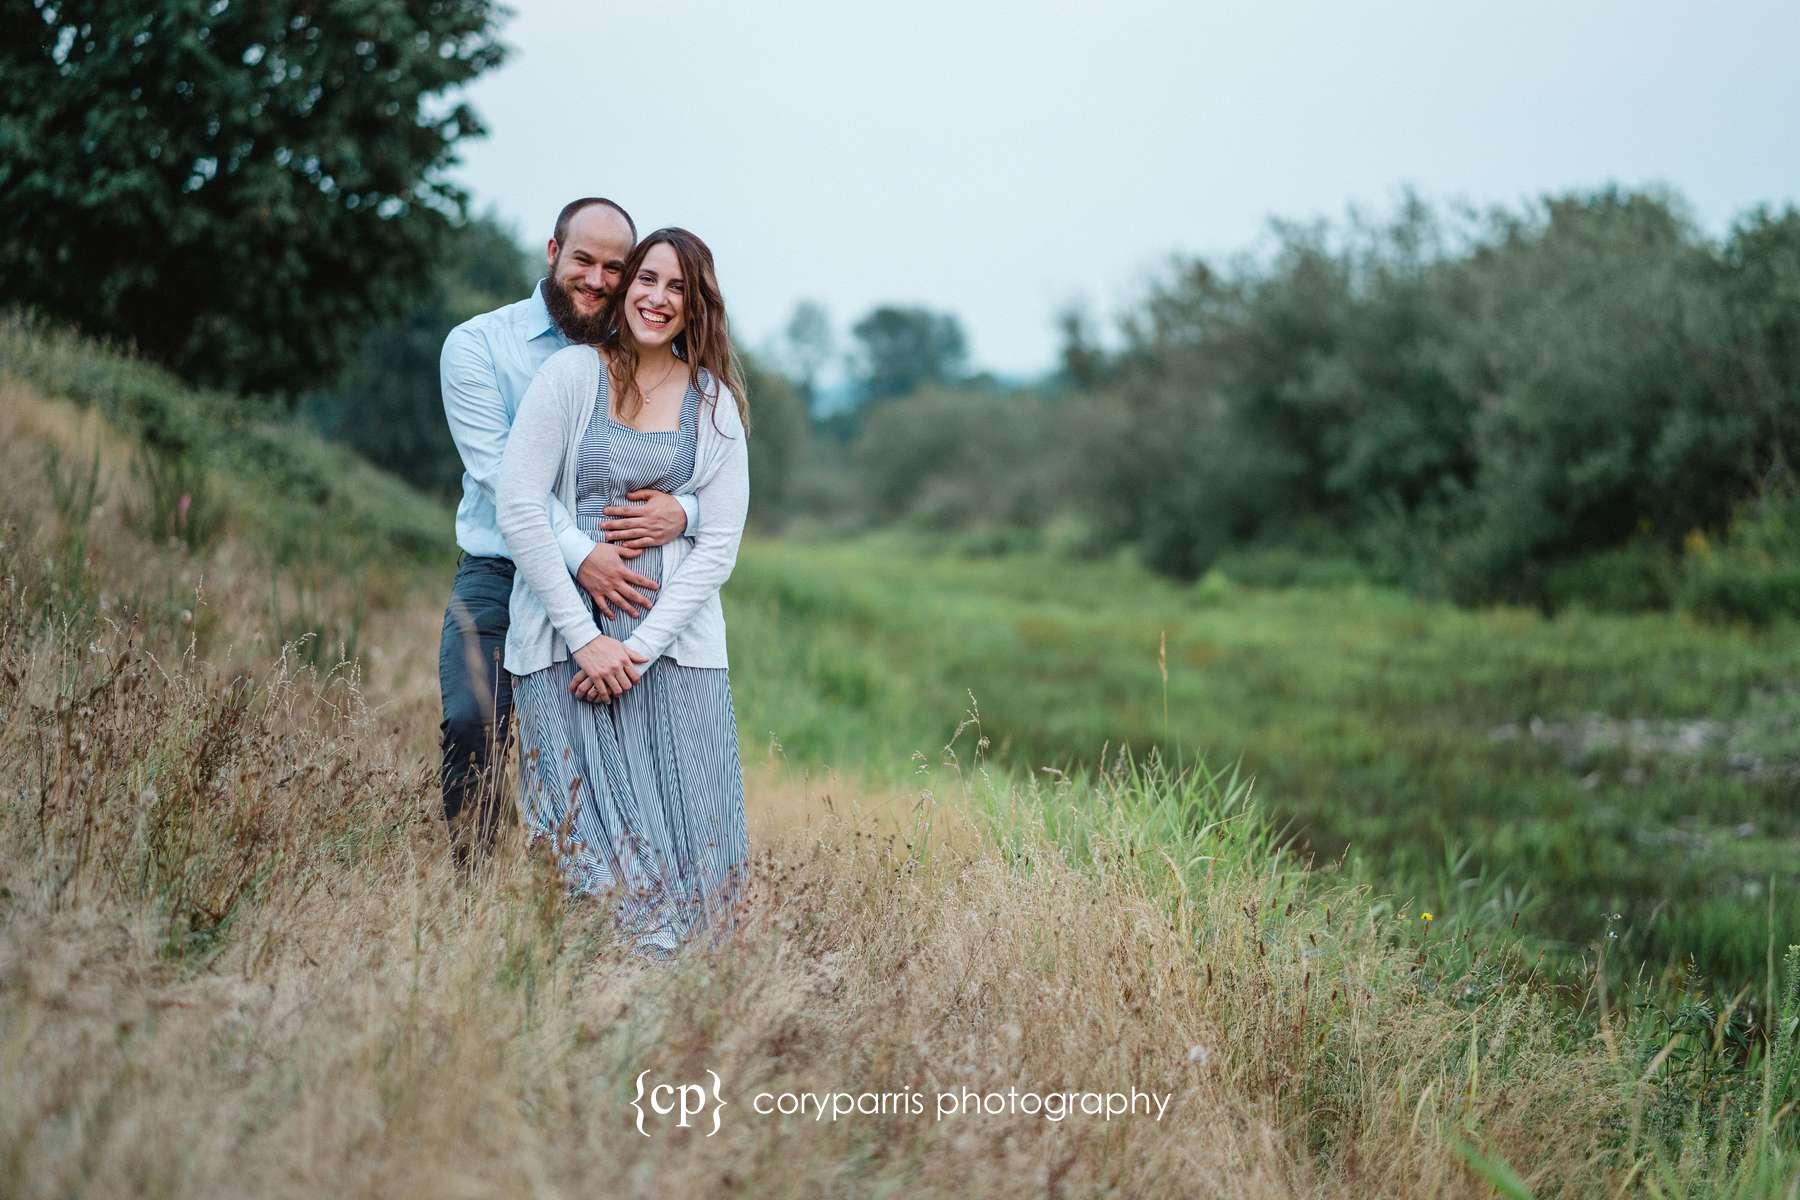 033-Engagement-Portraits-Marrymoor-Park.jpg